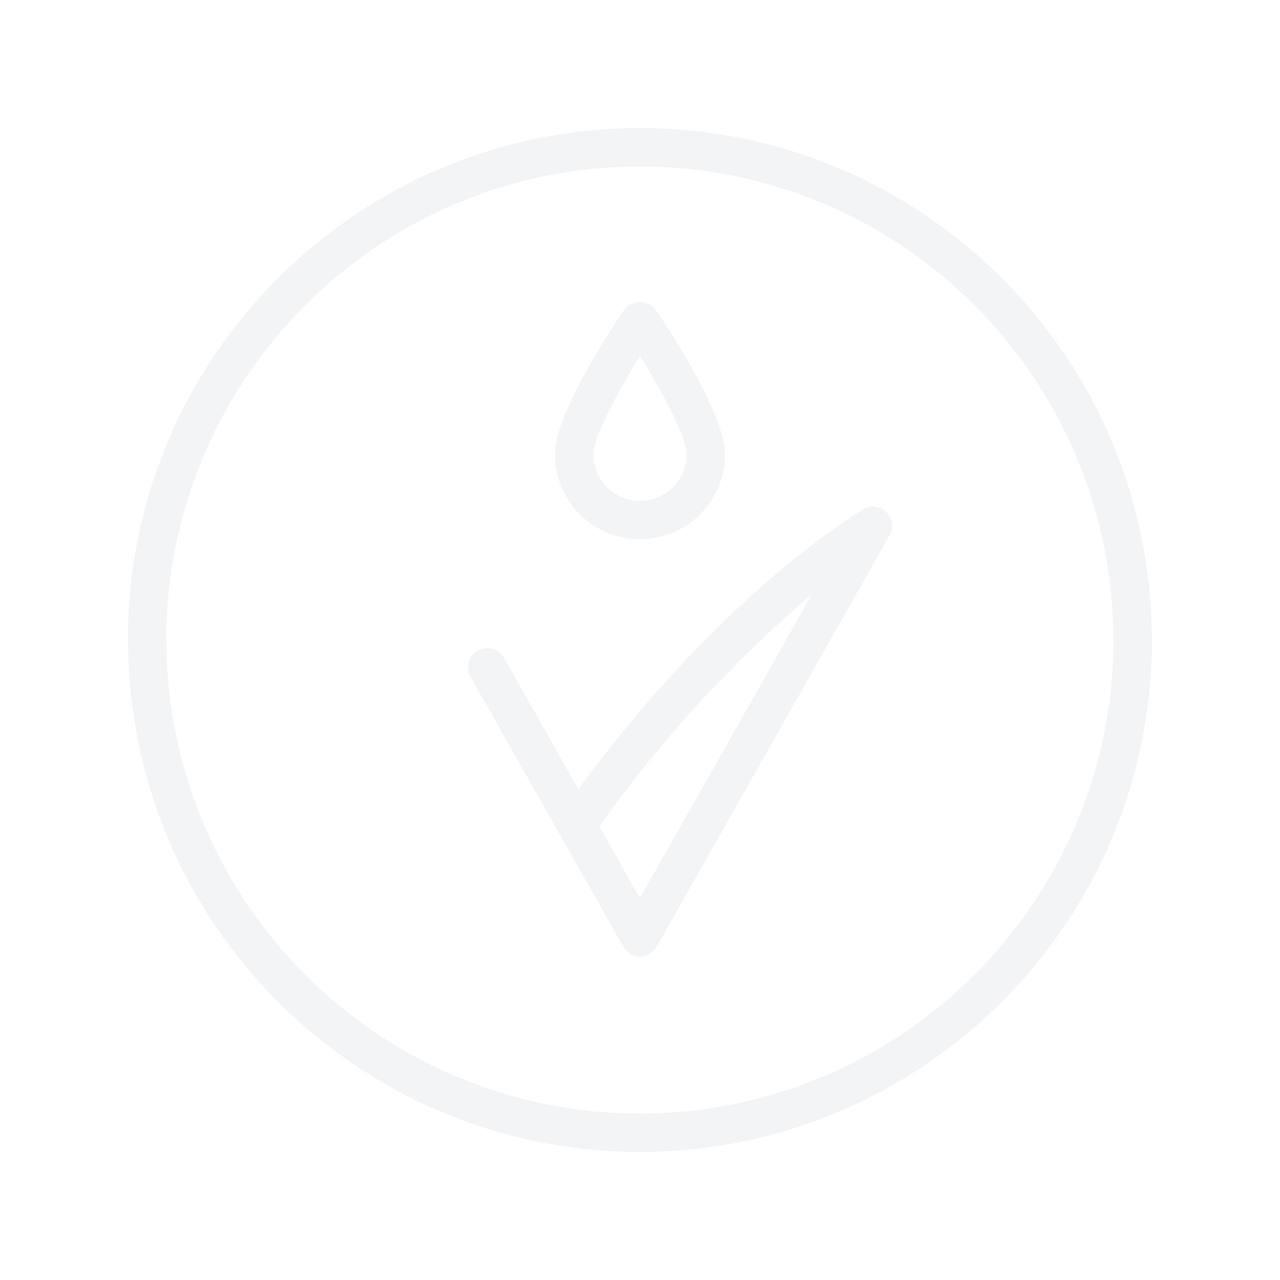 PAUL MITCHELL Strength Super Strong Daily Shampoo шампунь для поврежденных волос 300ml